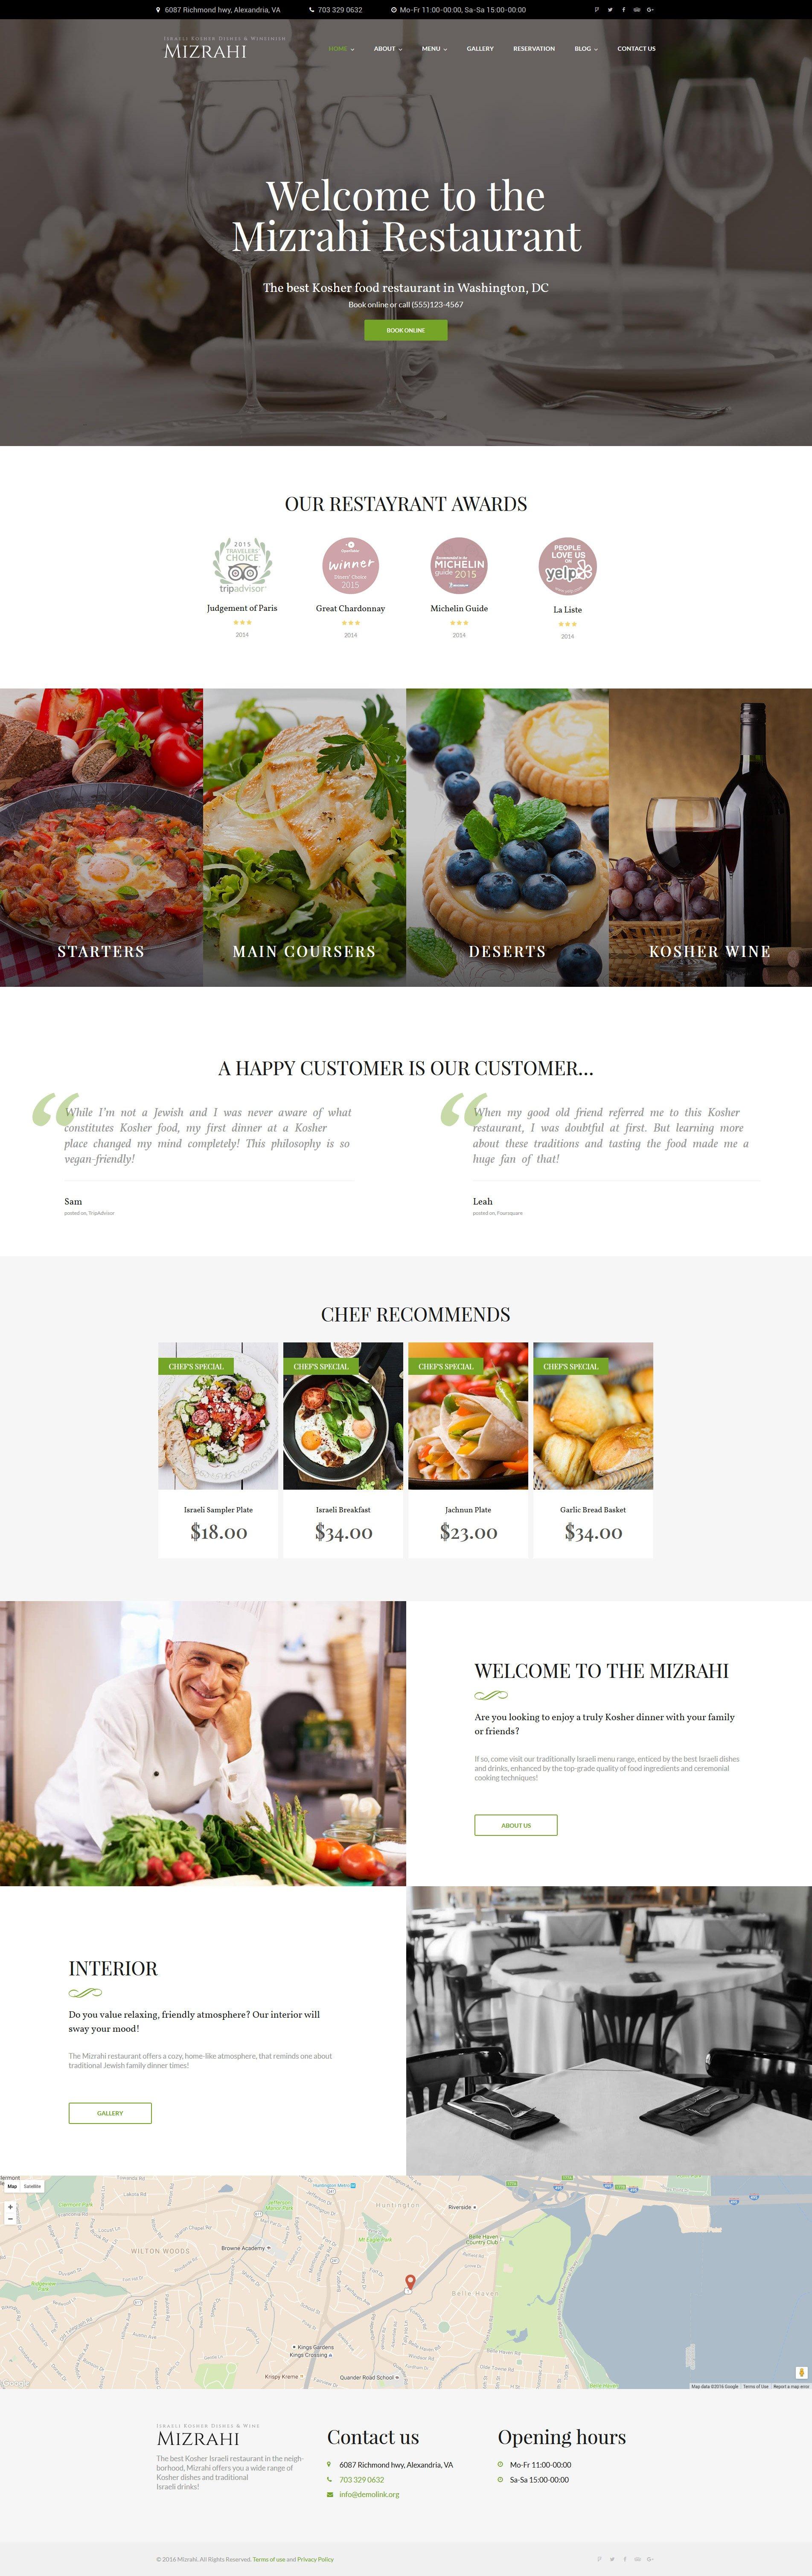 Адаптивный шаблон сайта на тему кафе и ресторан #60111